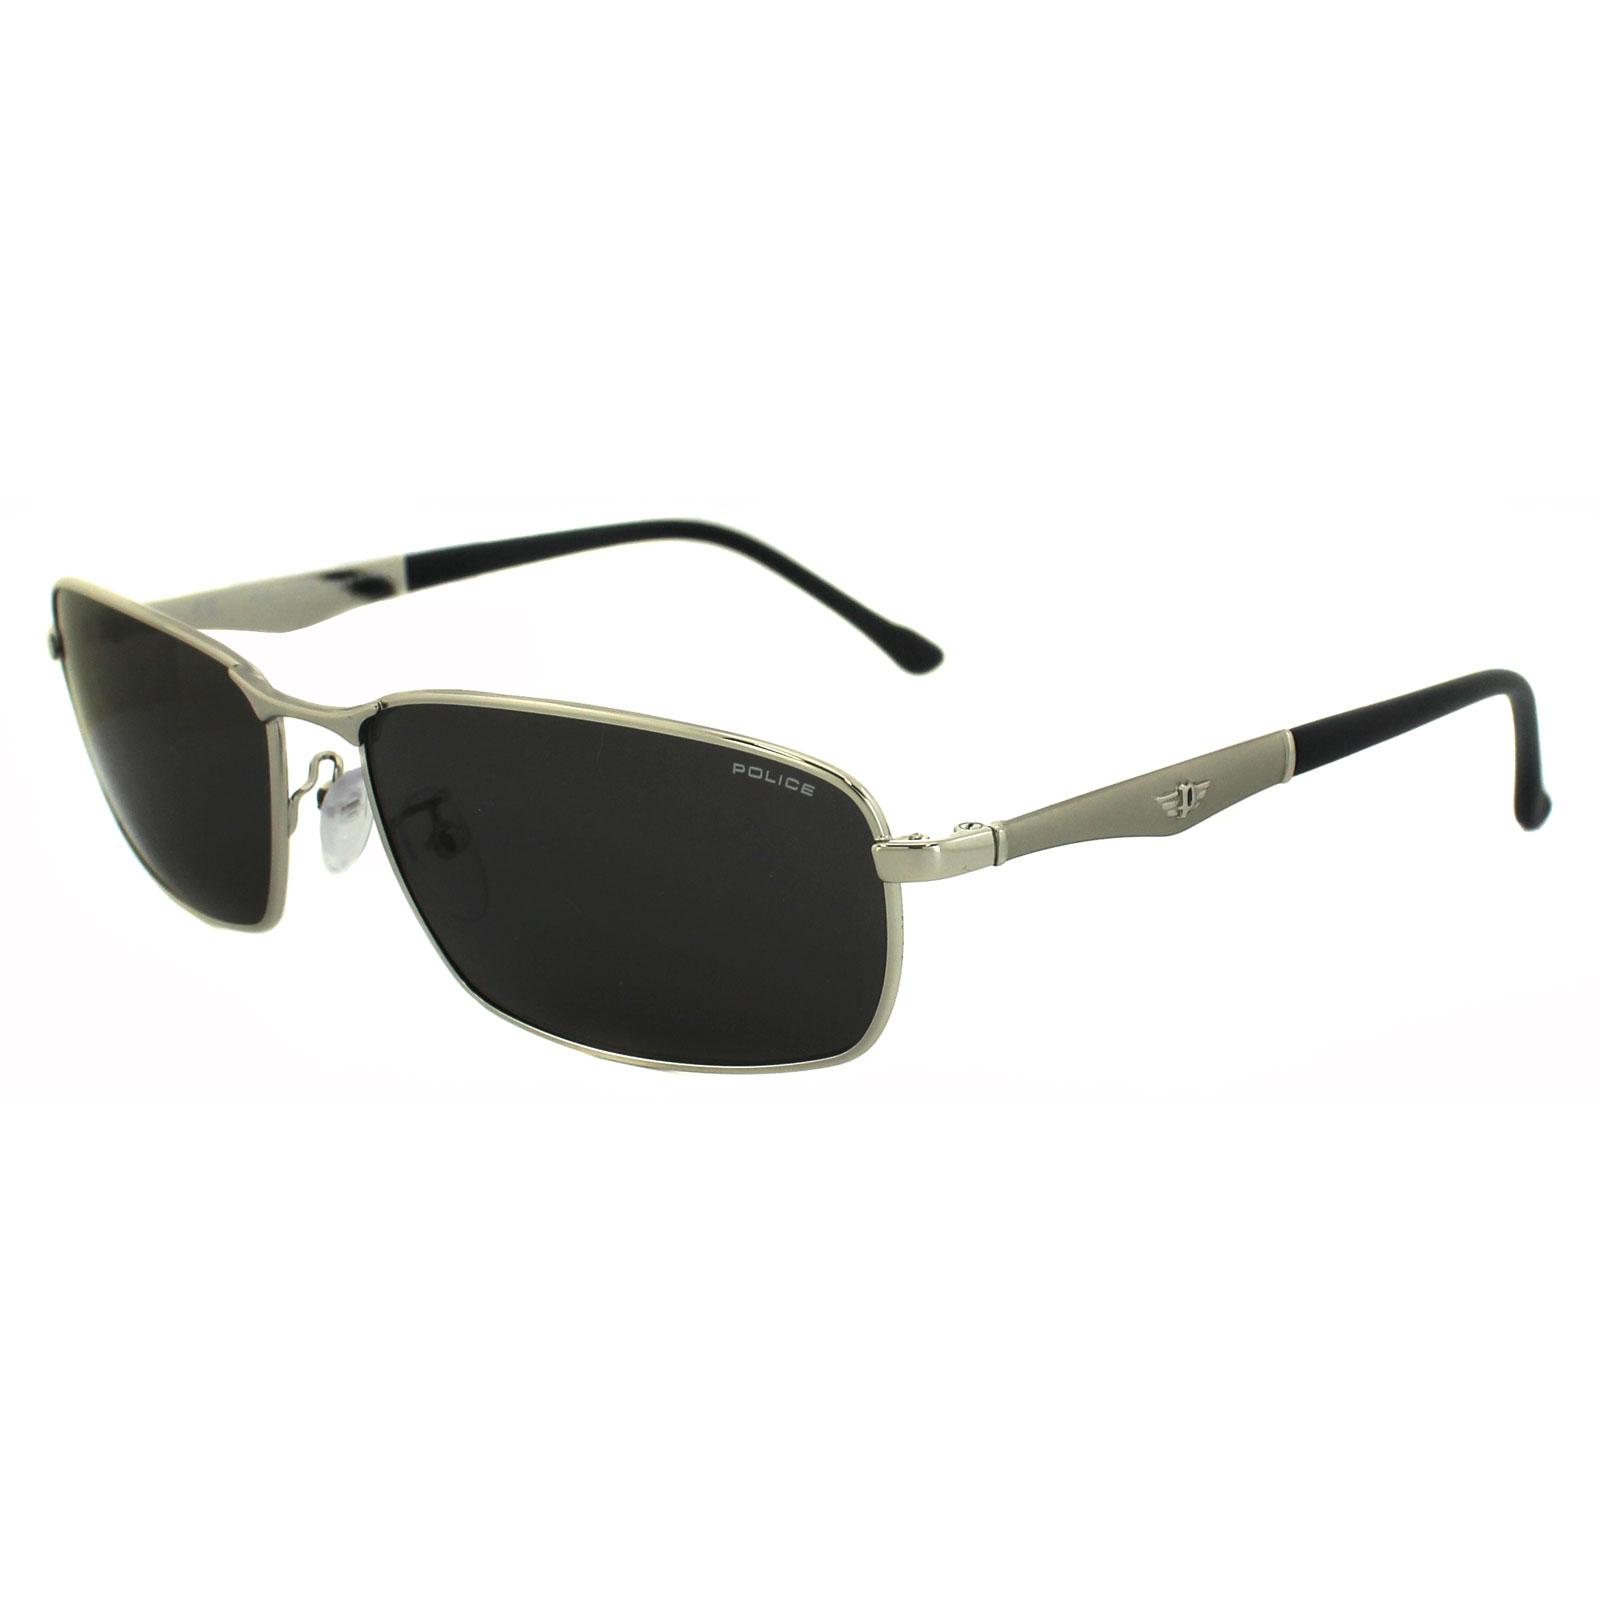 Police 8744 Sunglasses